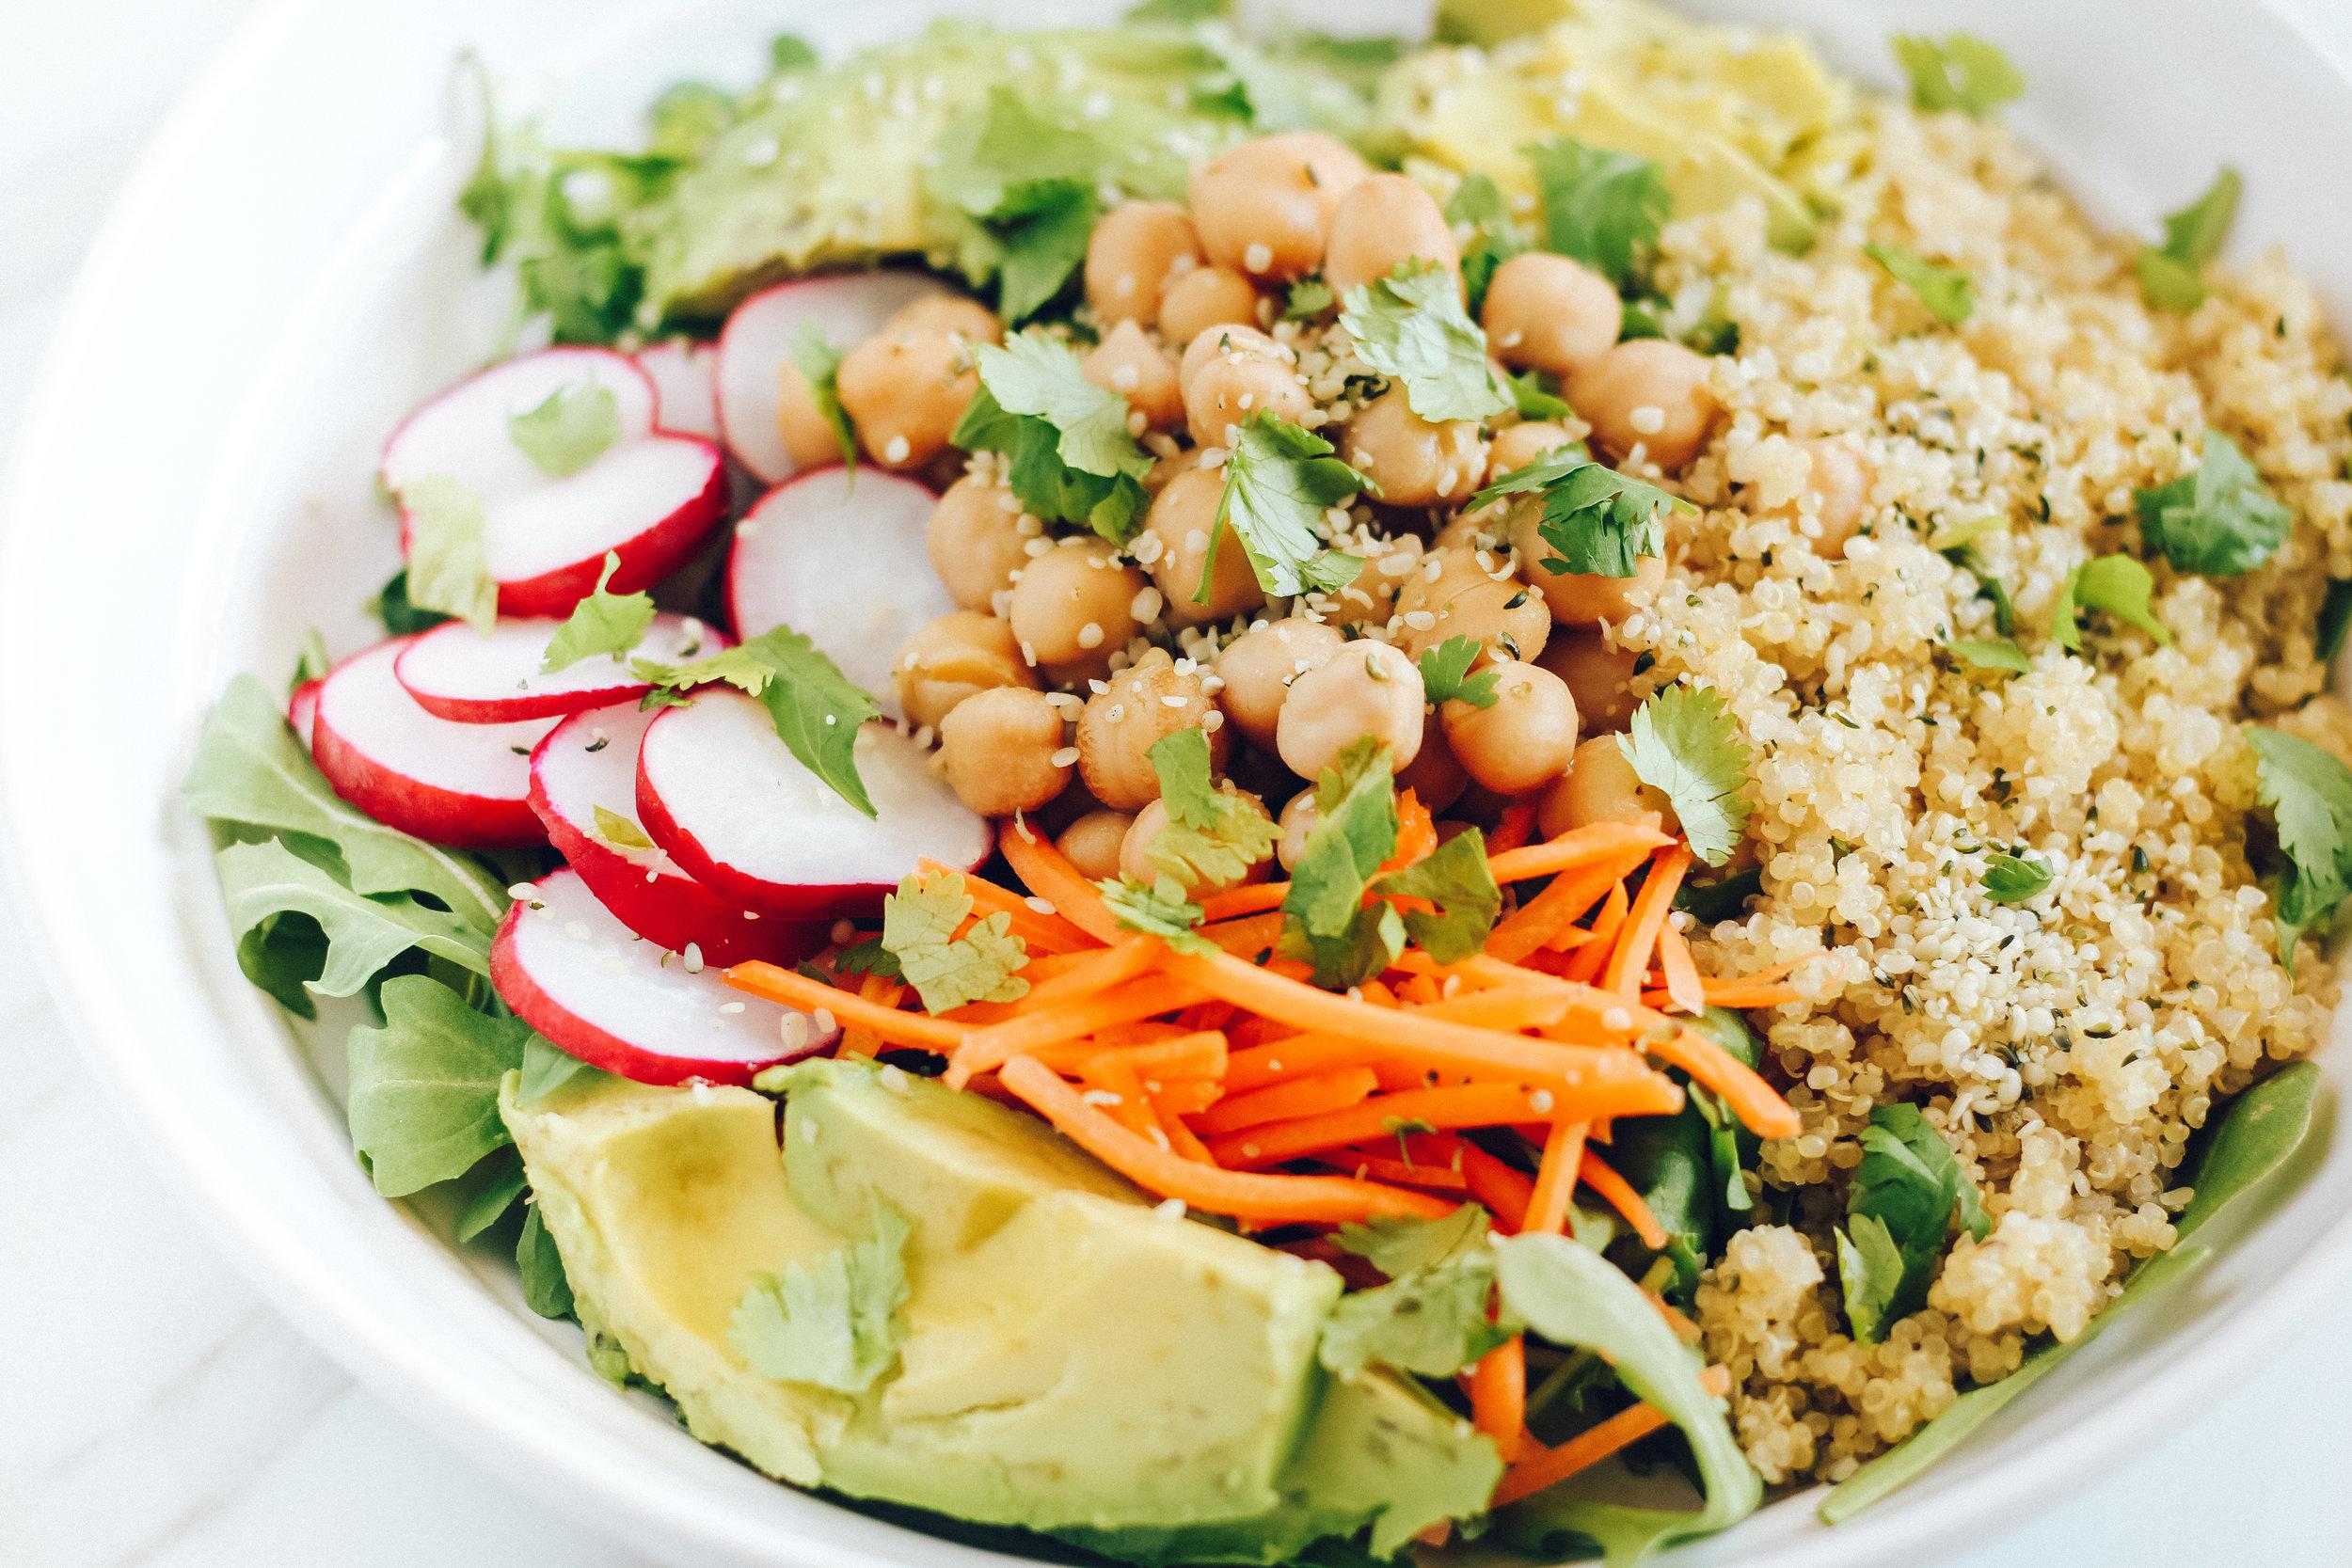 Arugula Quinoa Salad Stone Ground Mustard Dressing